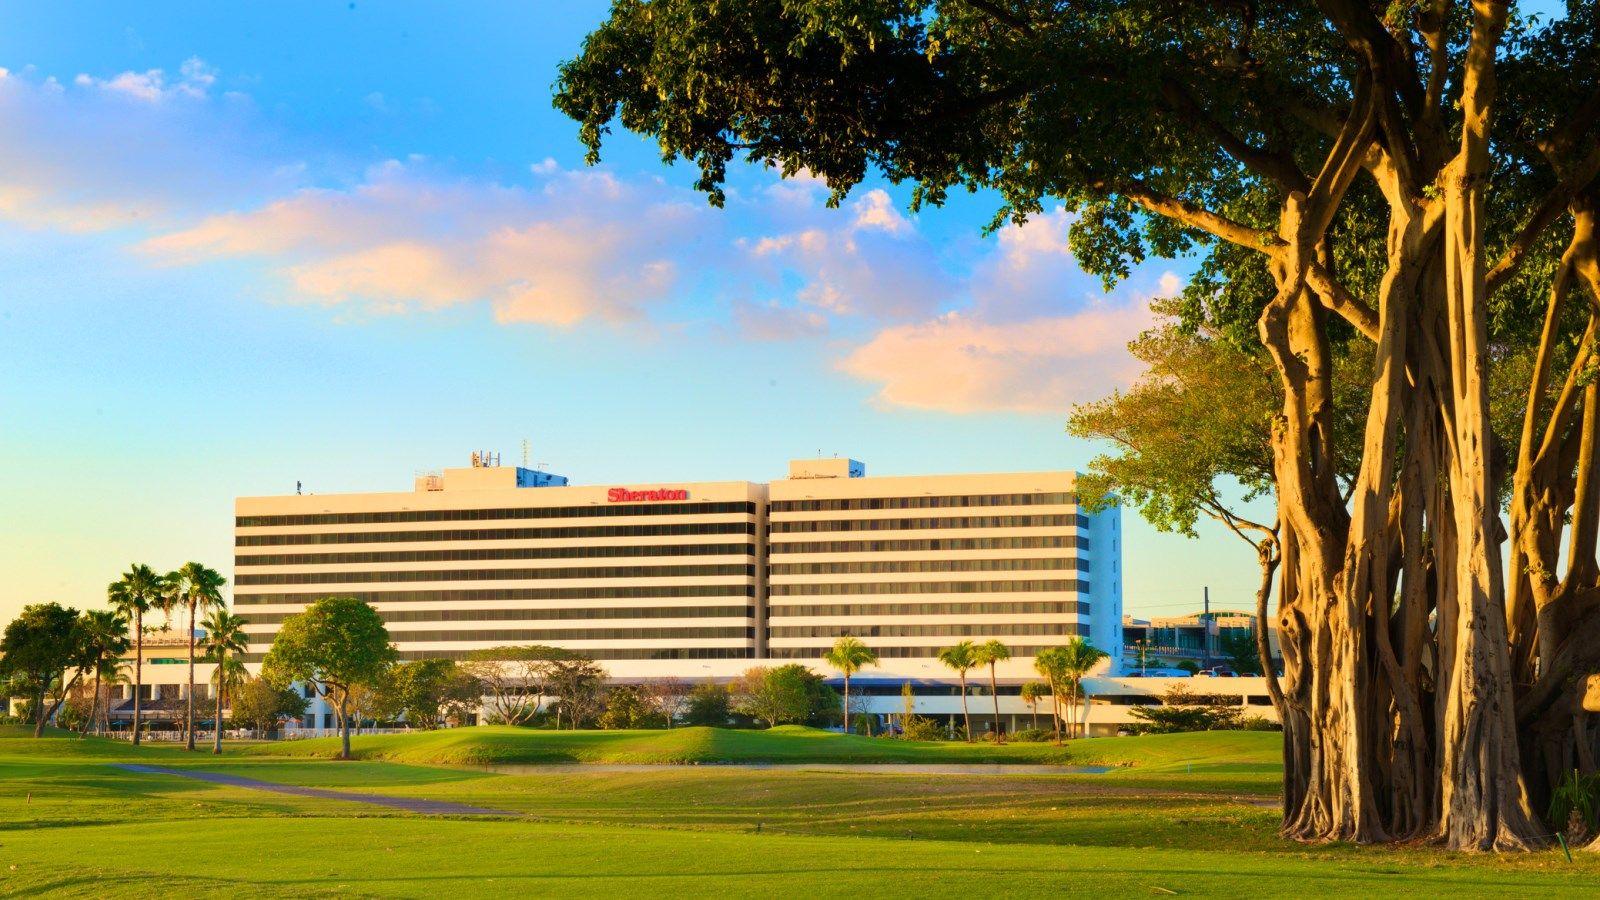 Sheraton Miami Airport Hotel & Executive Meeting Center image 0